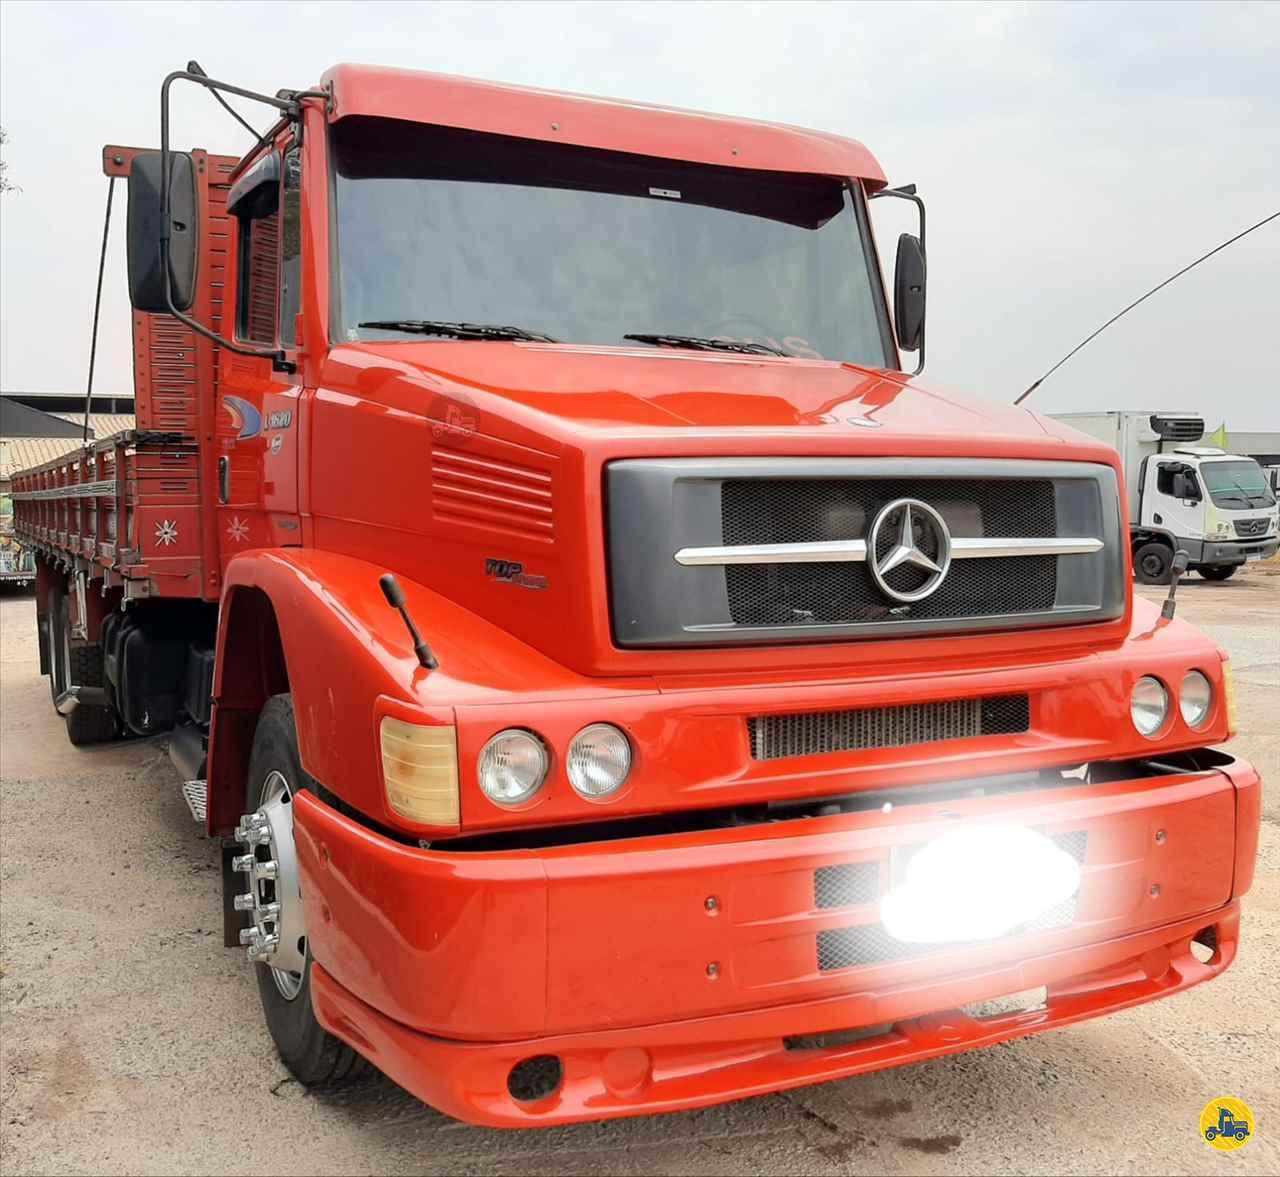 CAMINHAO MERCEDES-BENZ MB 1620 Carga Seca Truck 6x2 GP Trucks PIRACICABA SÃO PAULO SP